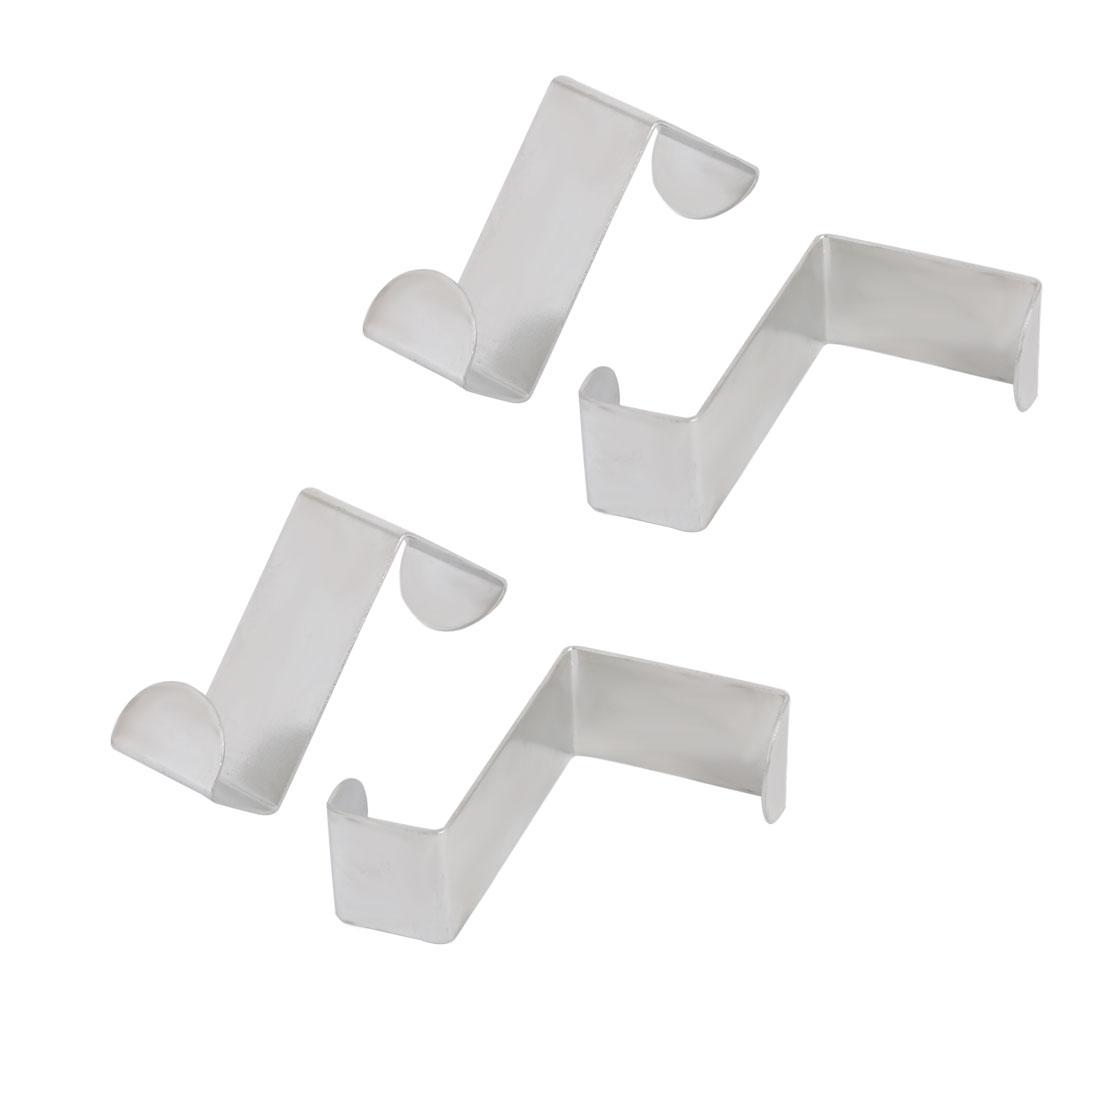 Household Wardrobe Stainless Steel Door Hook Hanger Organizer Silver Tone 4pcs